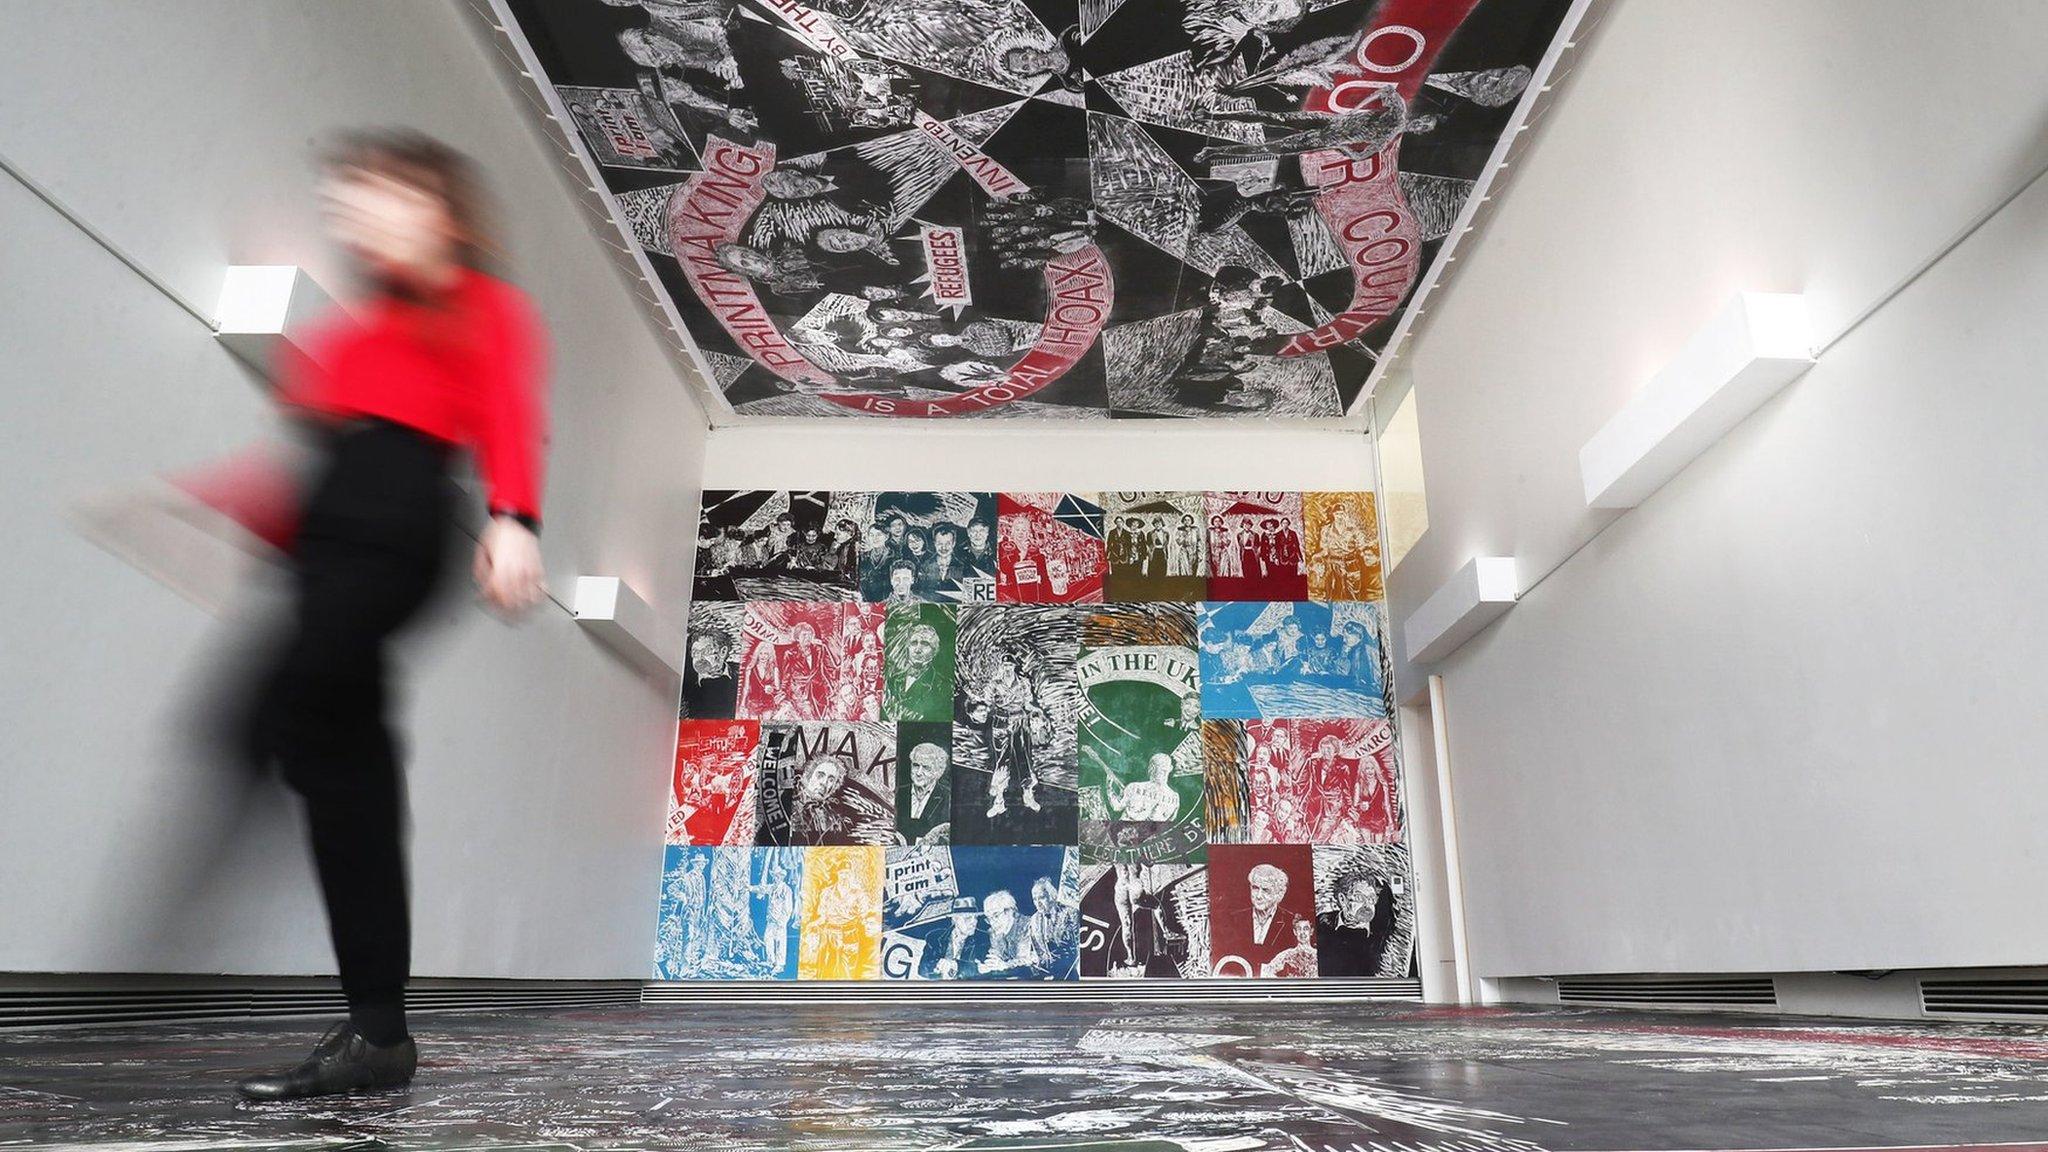 Former rubber factory to open as art hub in Edinburgh